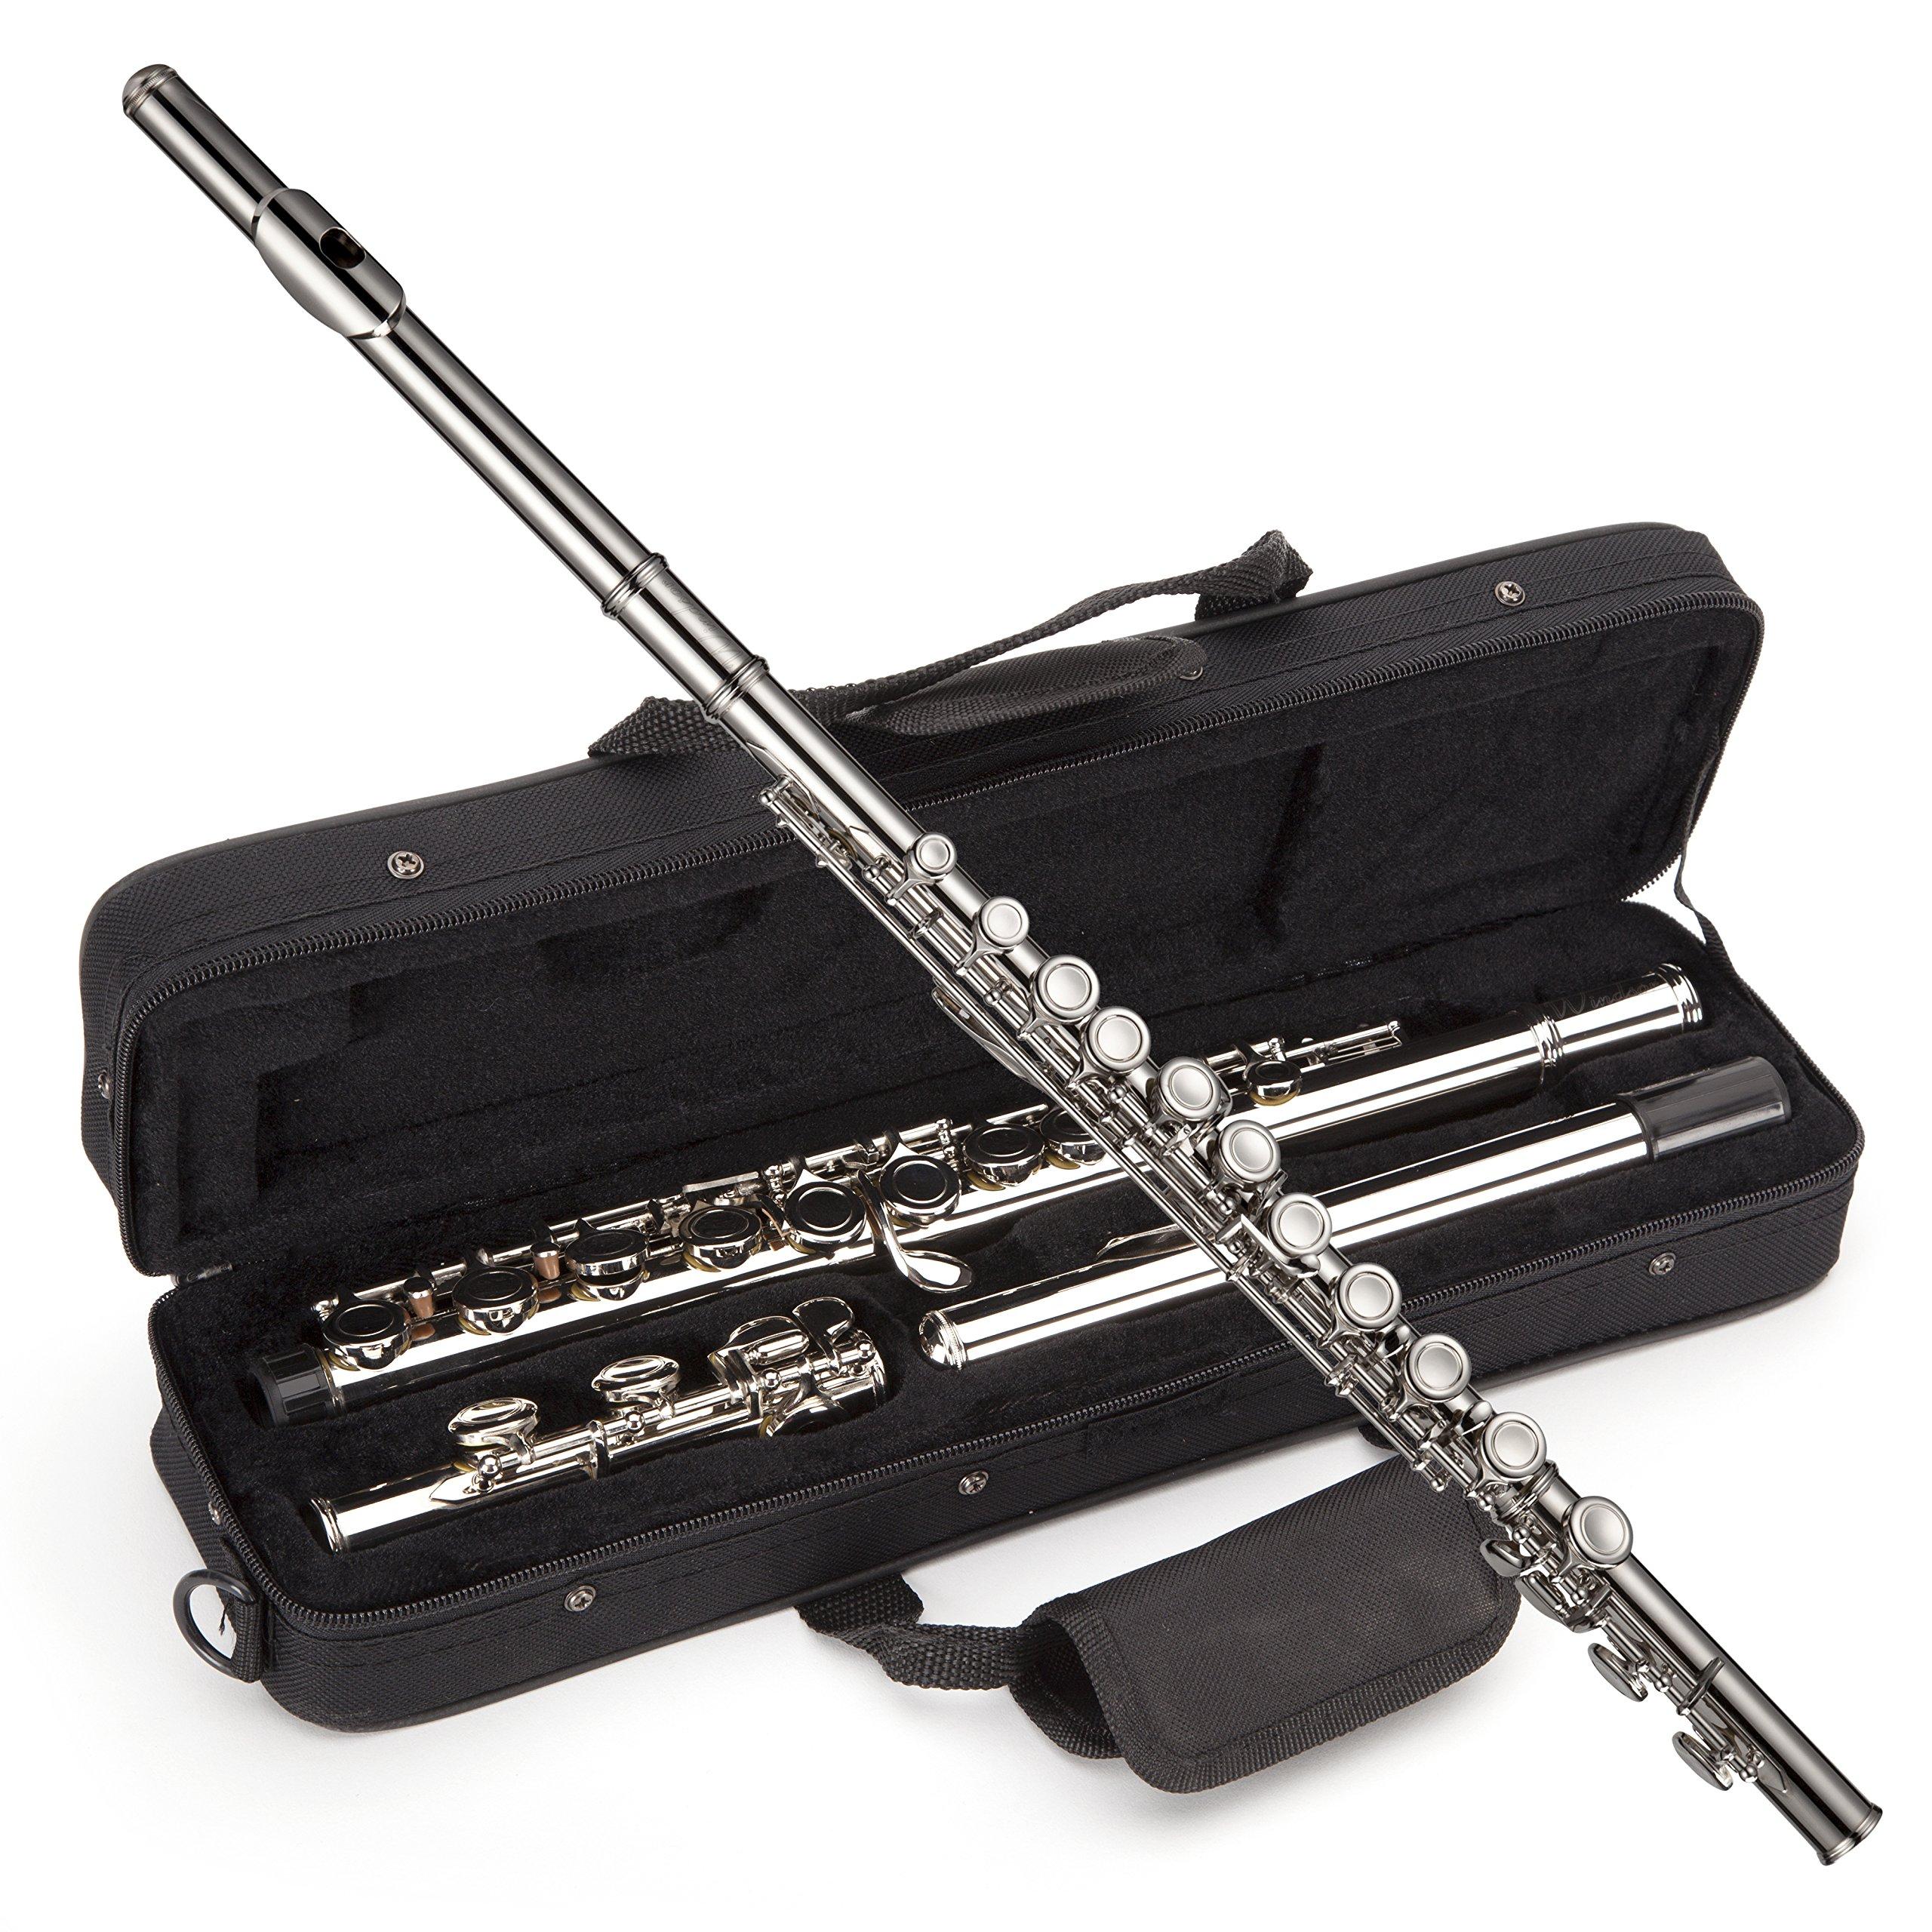 Windsor Student Nickel Plated Flute with Split E Key Includes Hard Case (MI-1002)